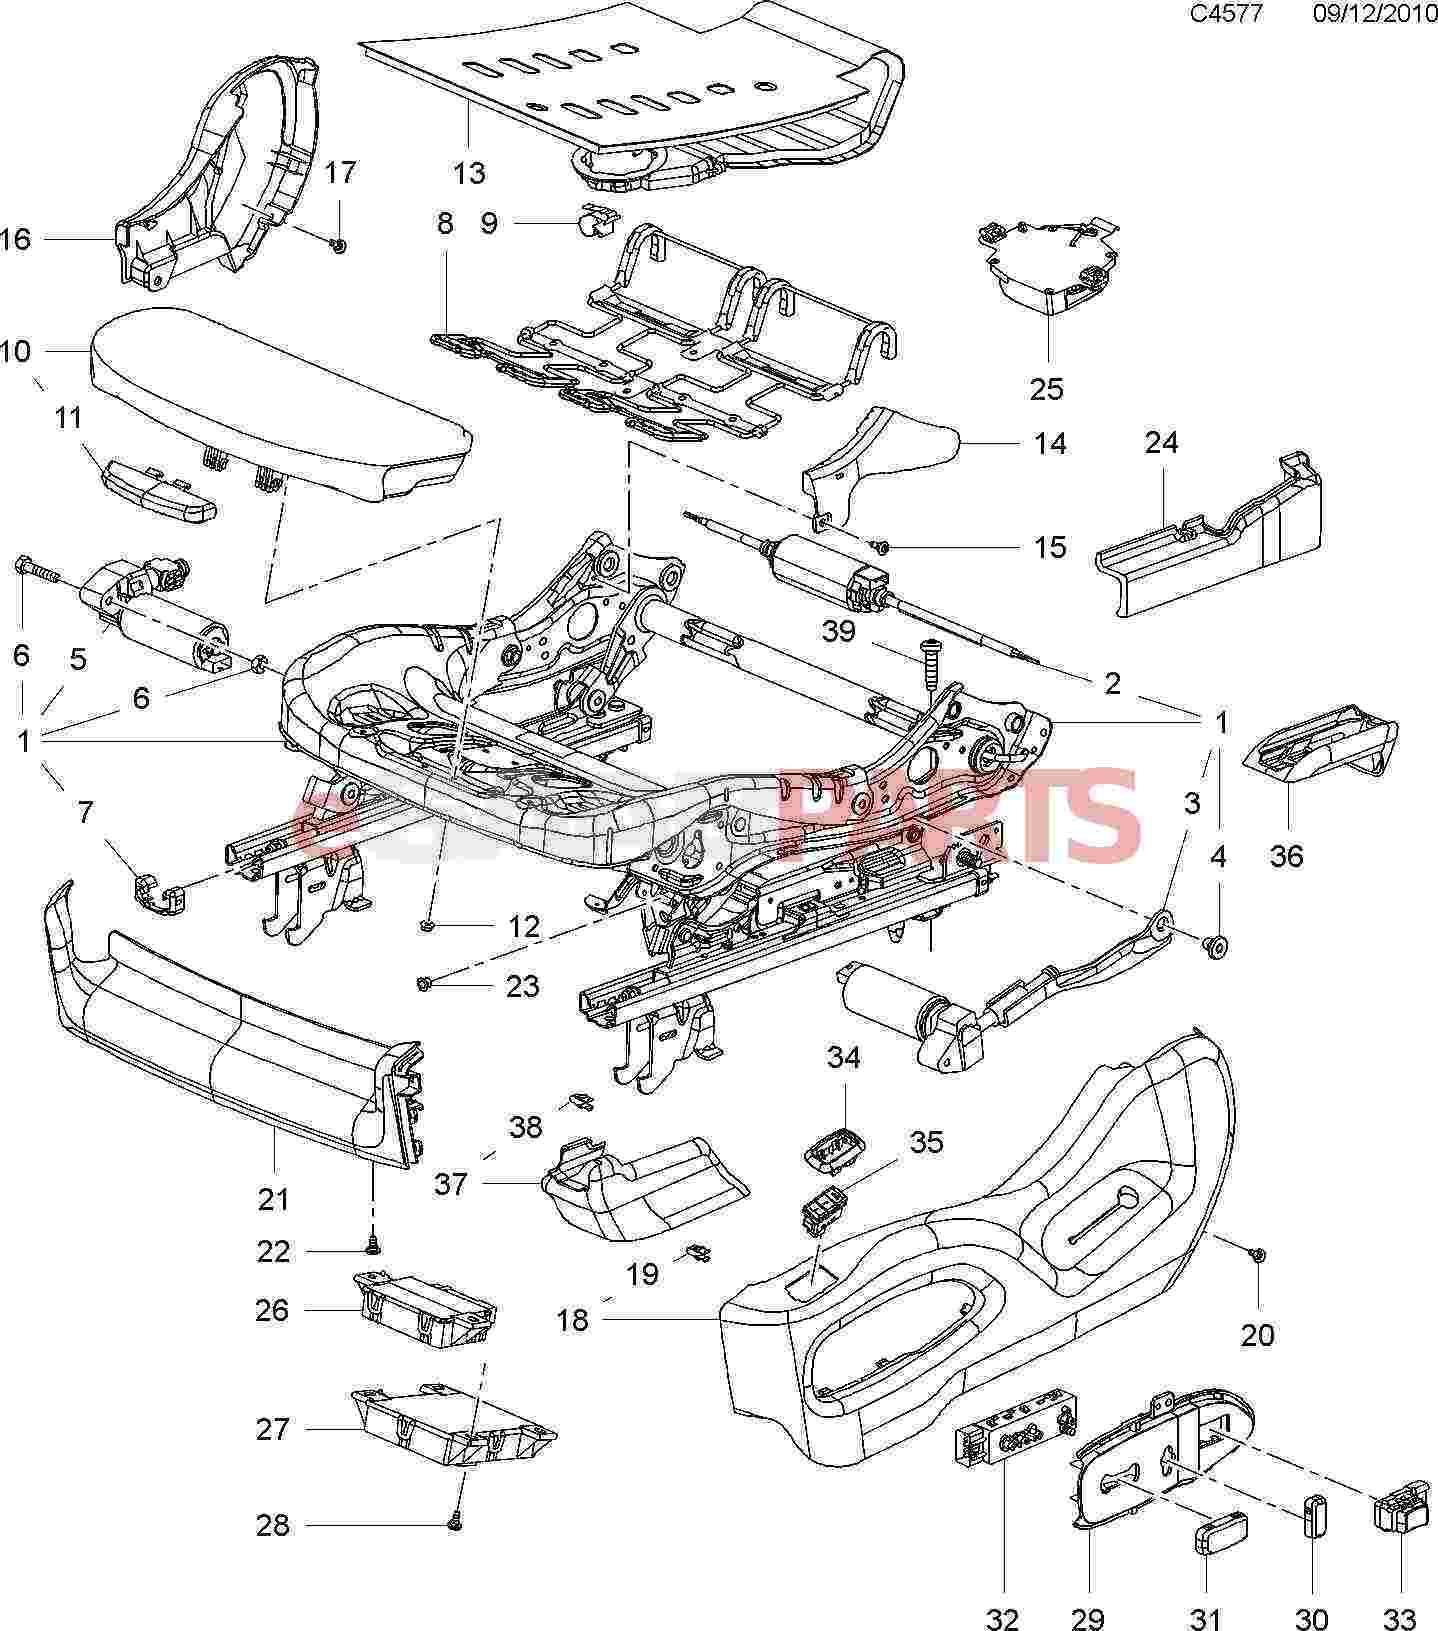 Esaabparts saab 9 4x 168 > car body internal parts > seats breakdown > cushion frame electric 8 way